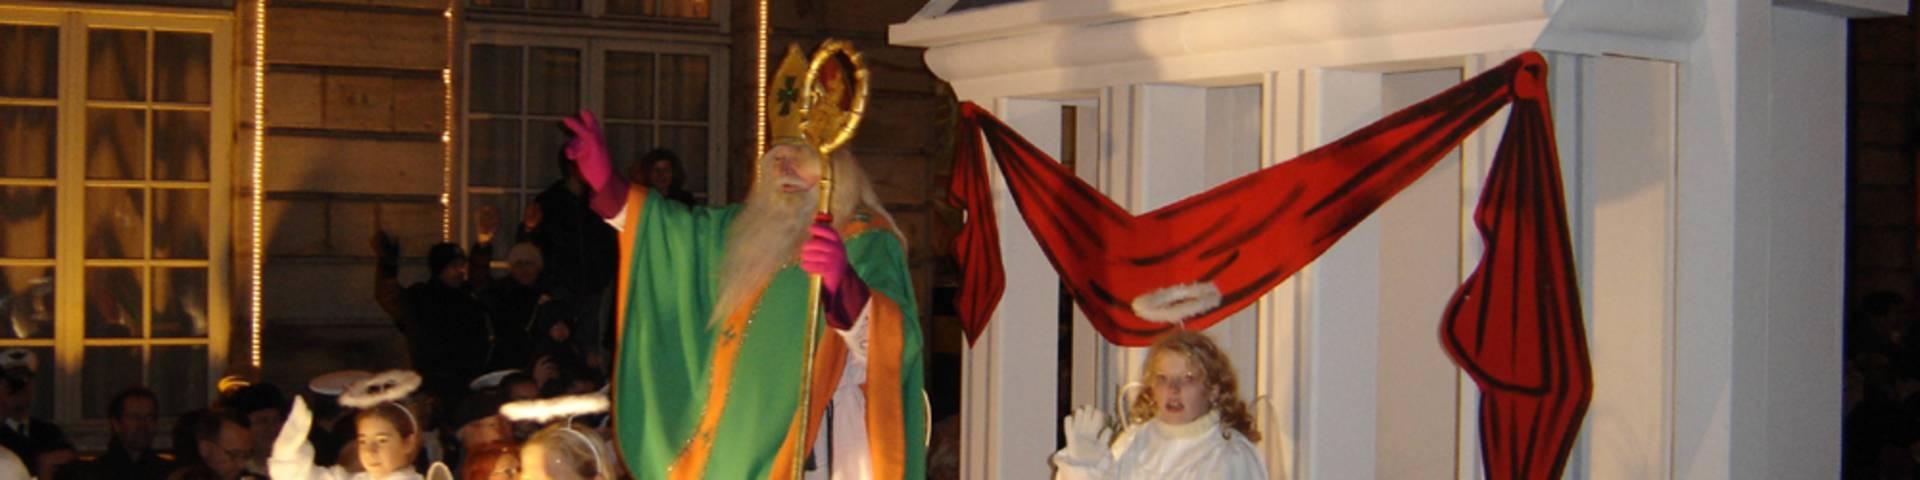 The True Story Of Saint Nicolas De Myre Epinal Tourism